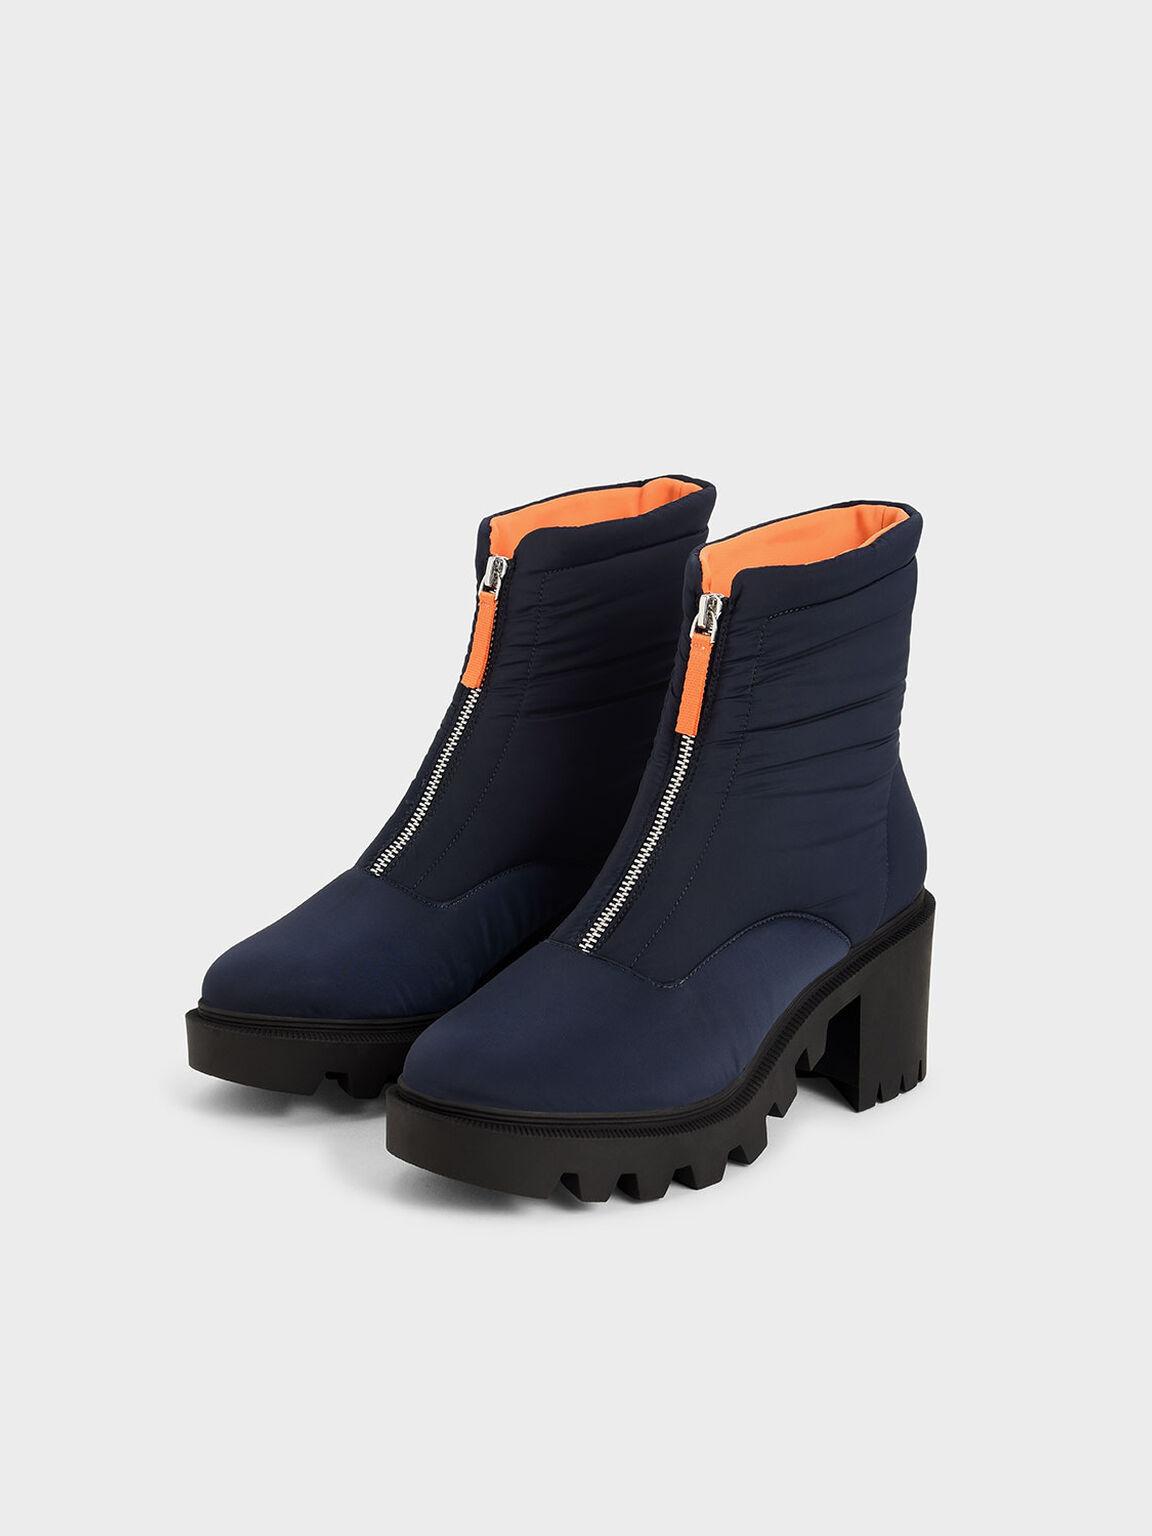 Sepatu Nylon Front Zip Ankle Boots, Dark Blue, hi-res